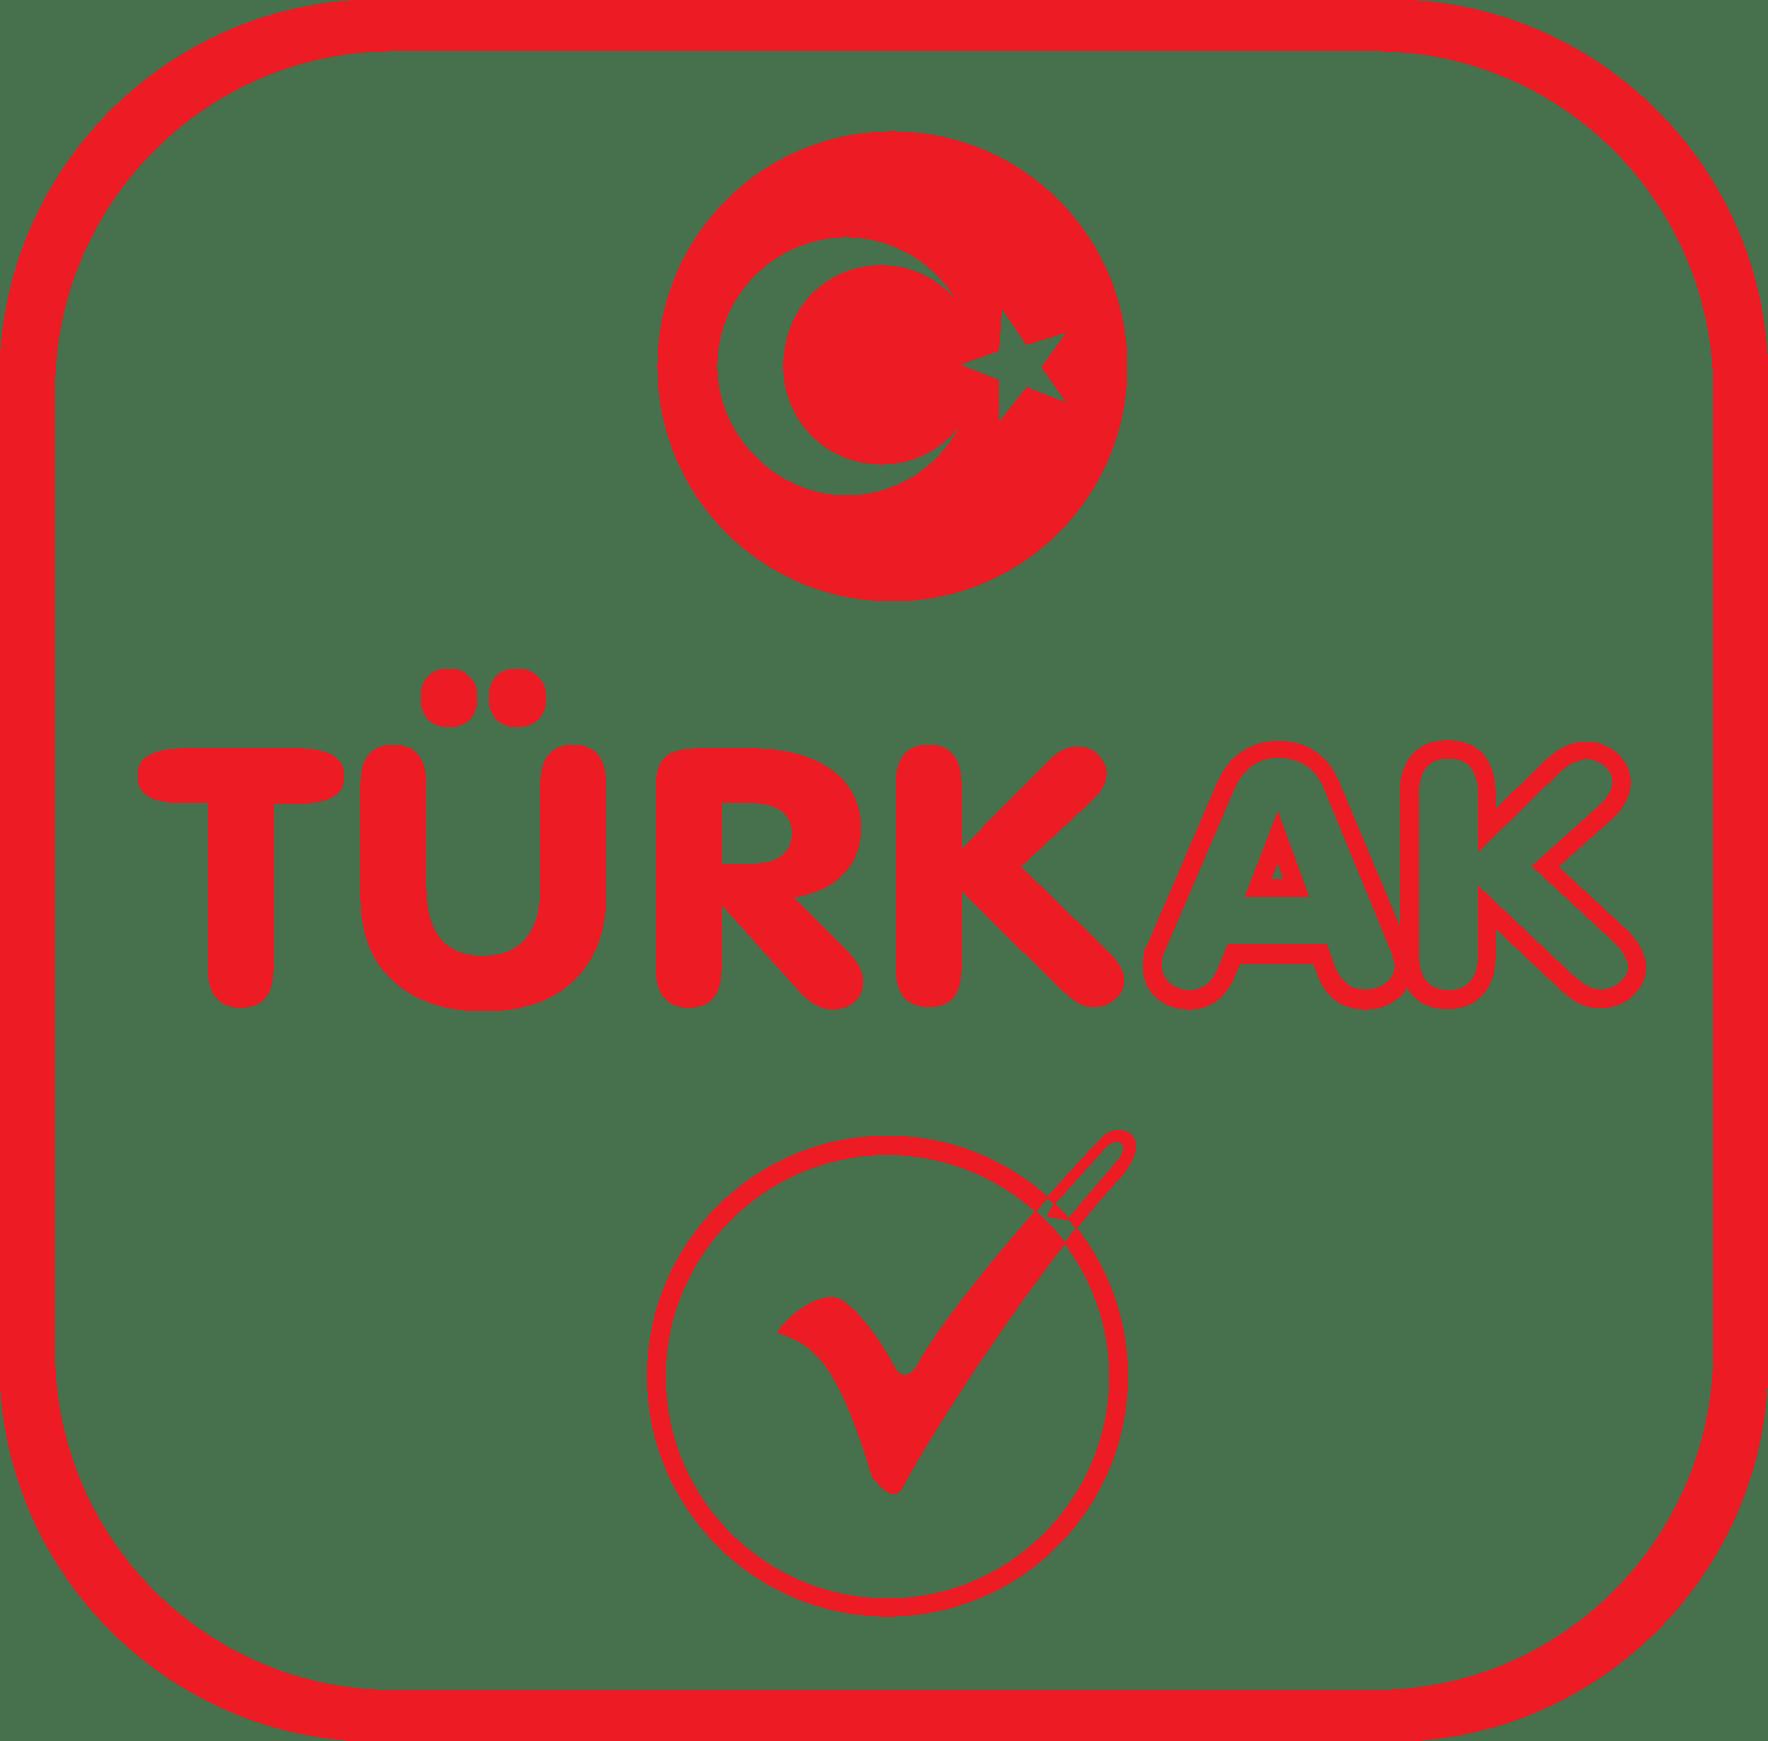 TÜRKAK Logo   Türk Akreditasyon Kurumu png